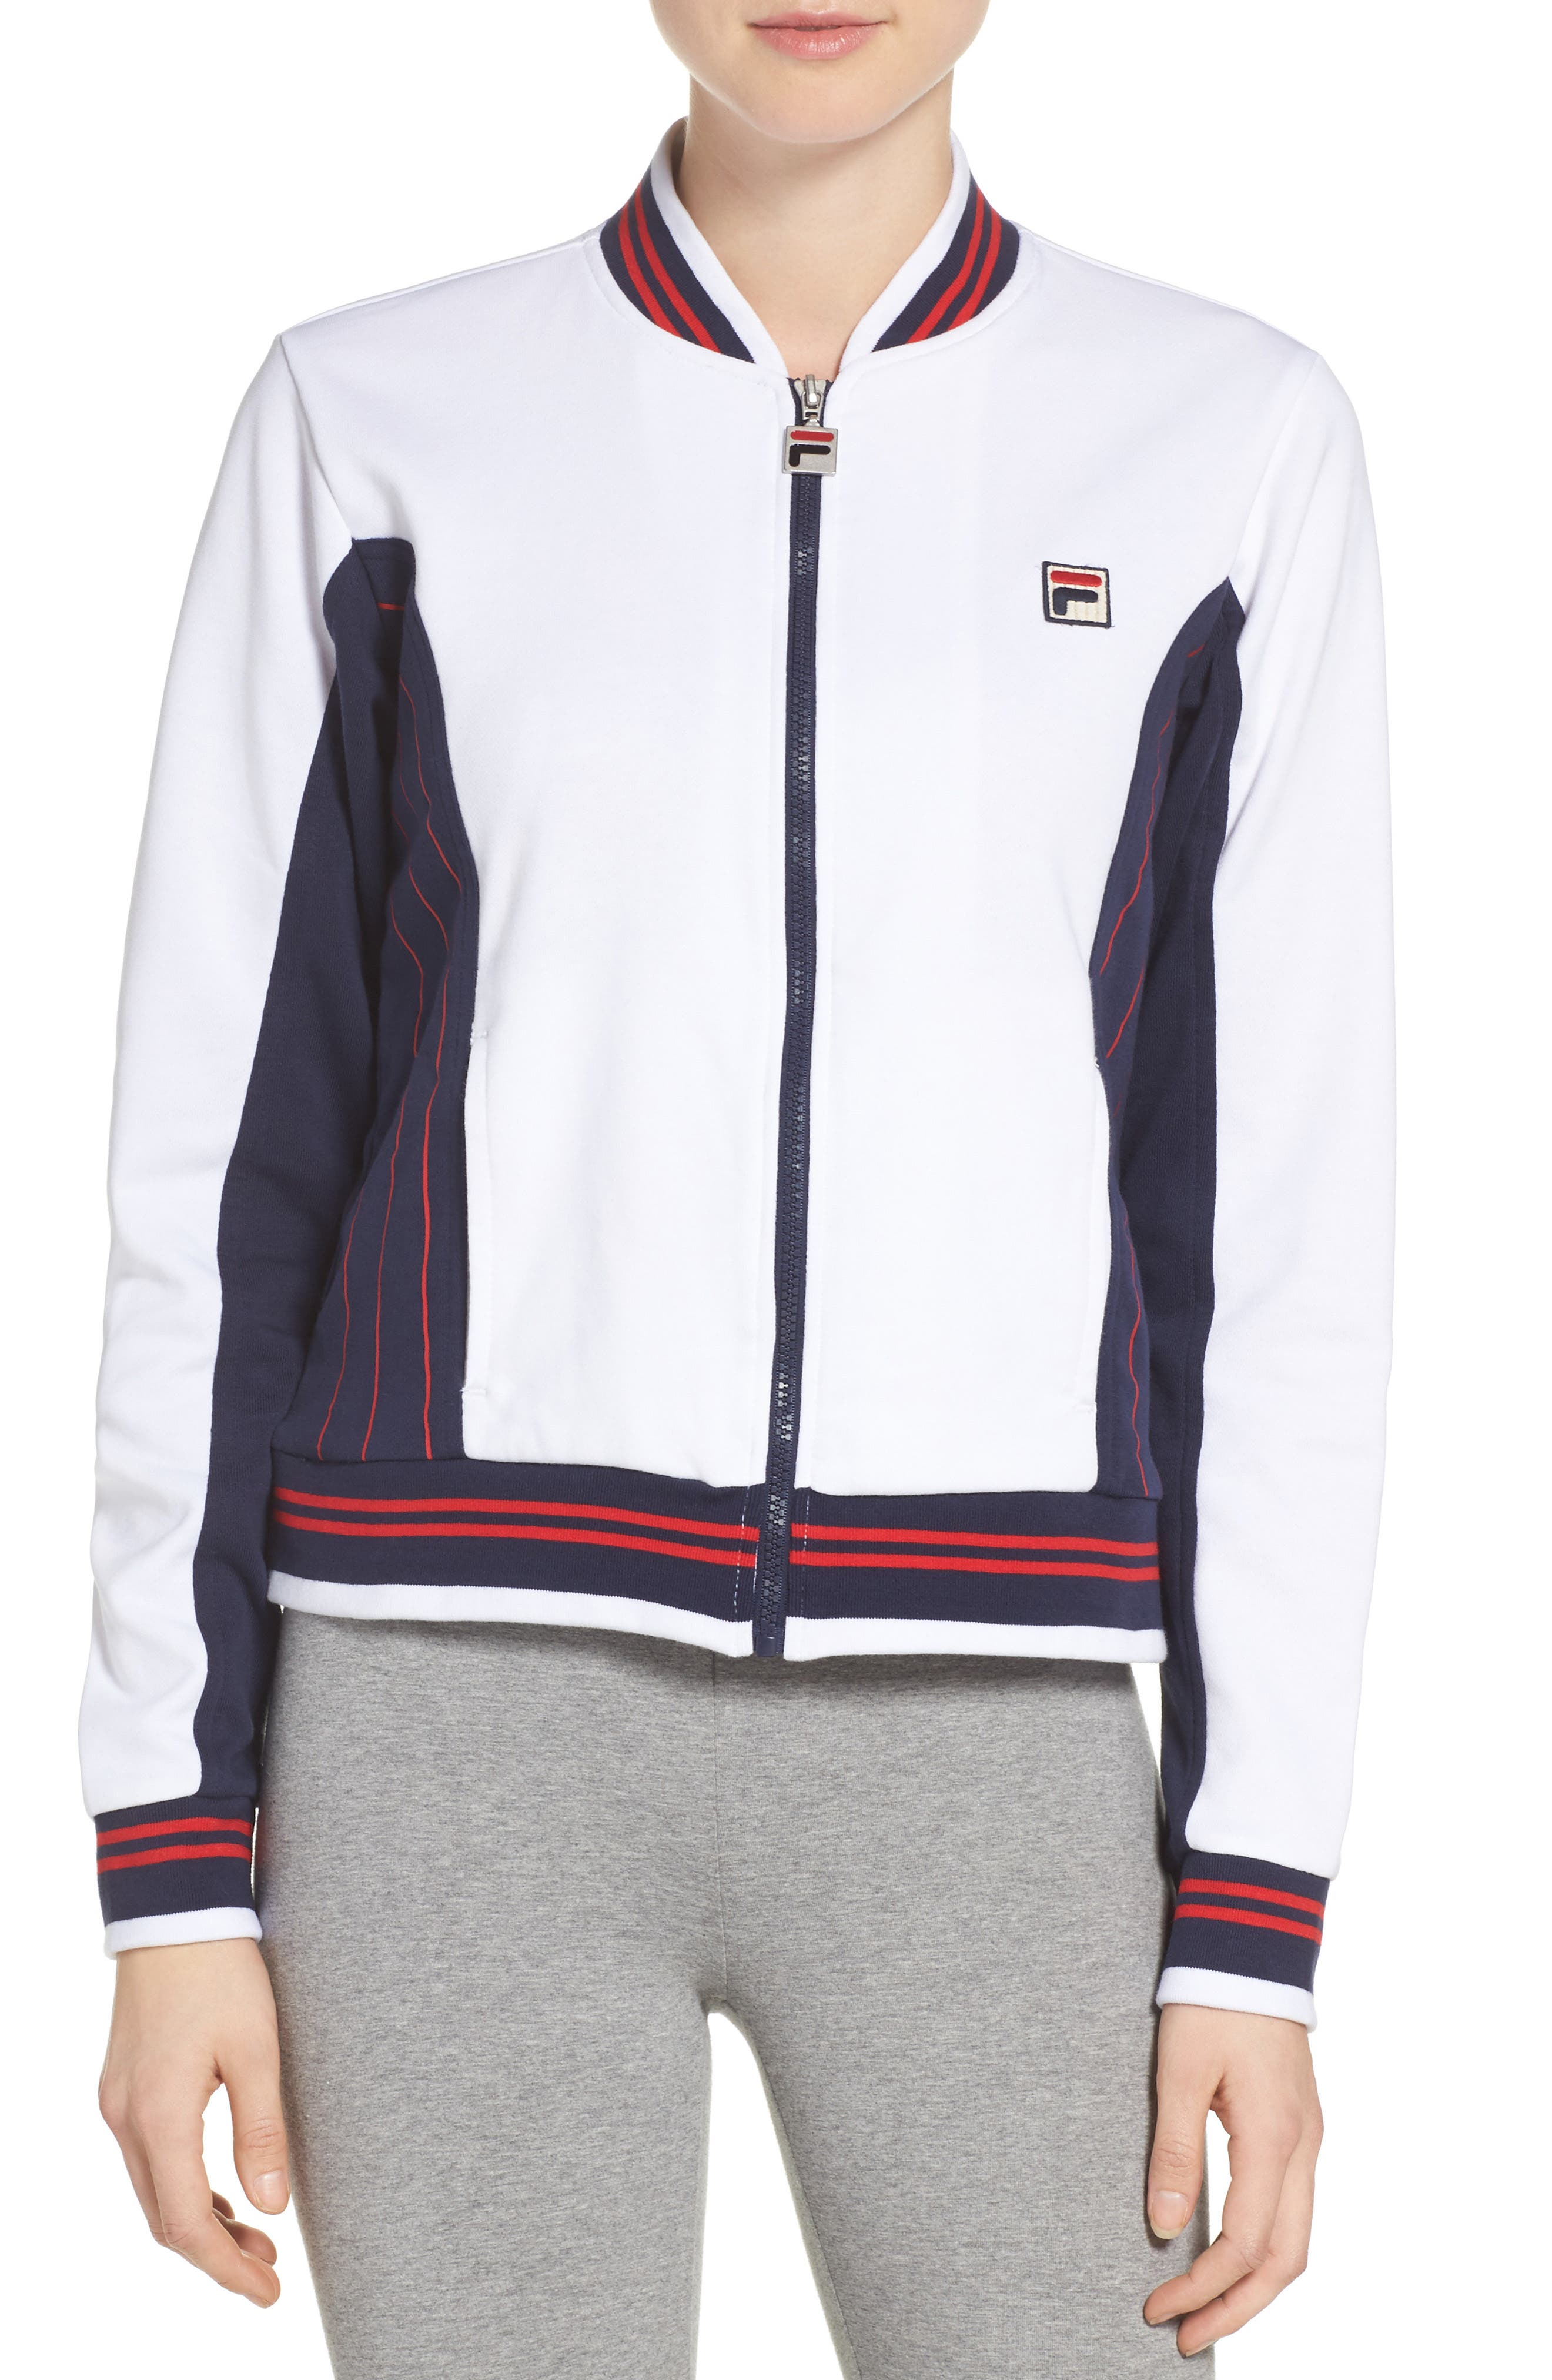 FILA Settanta II Jacket